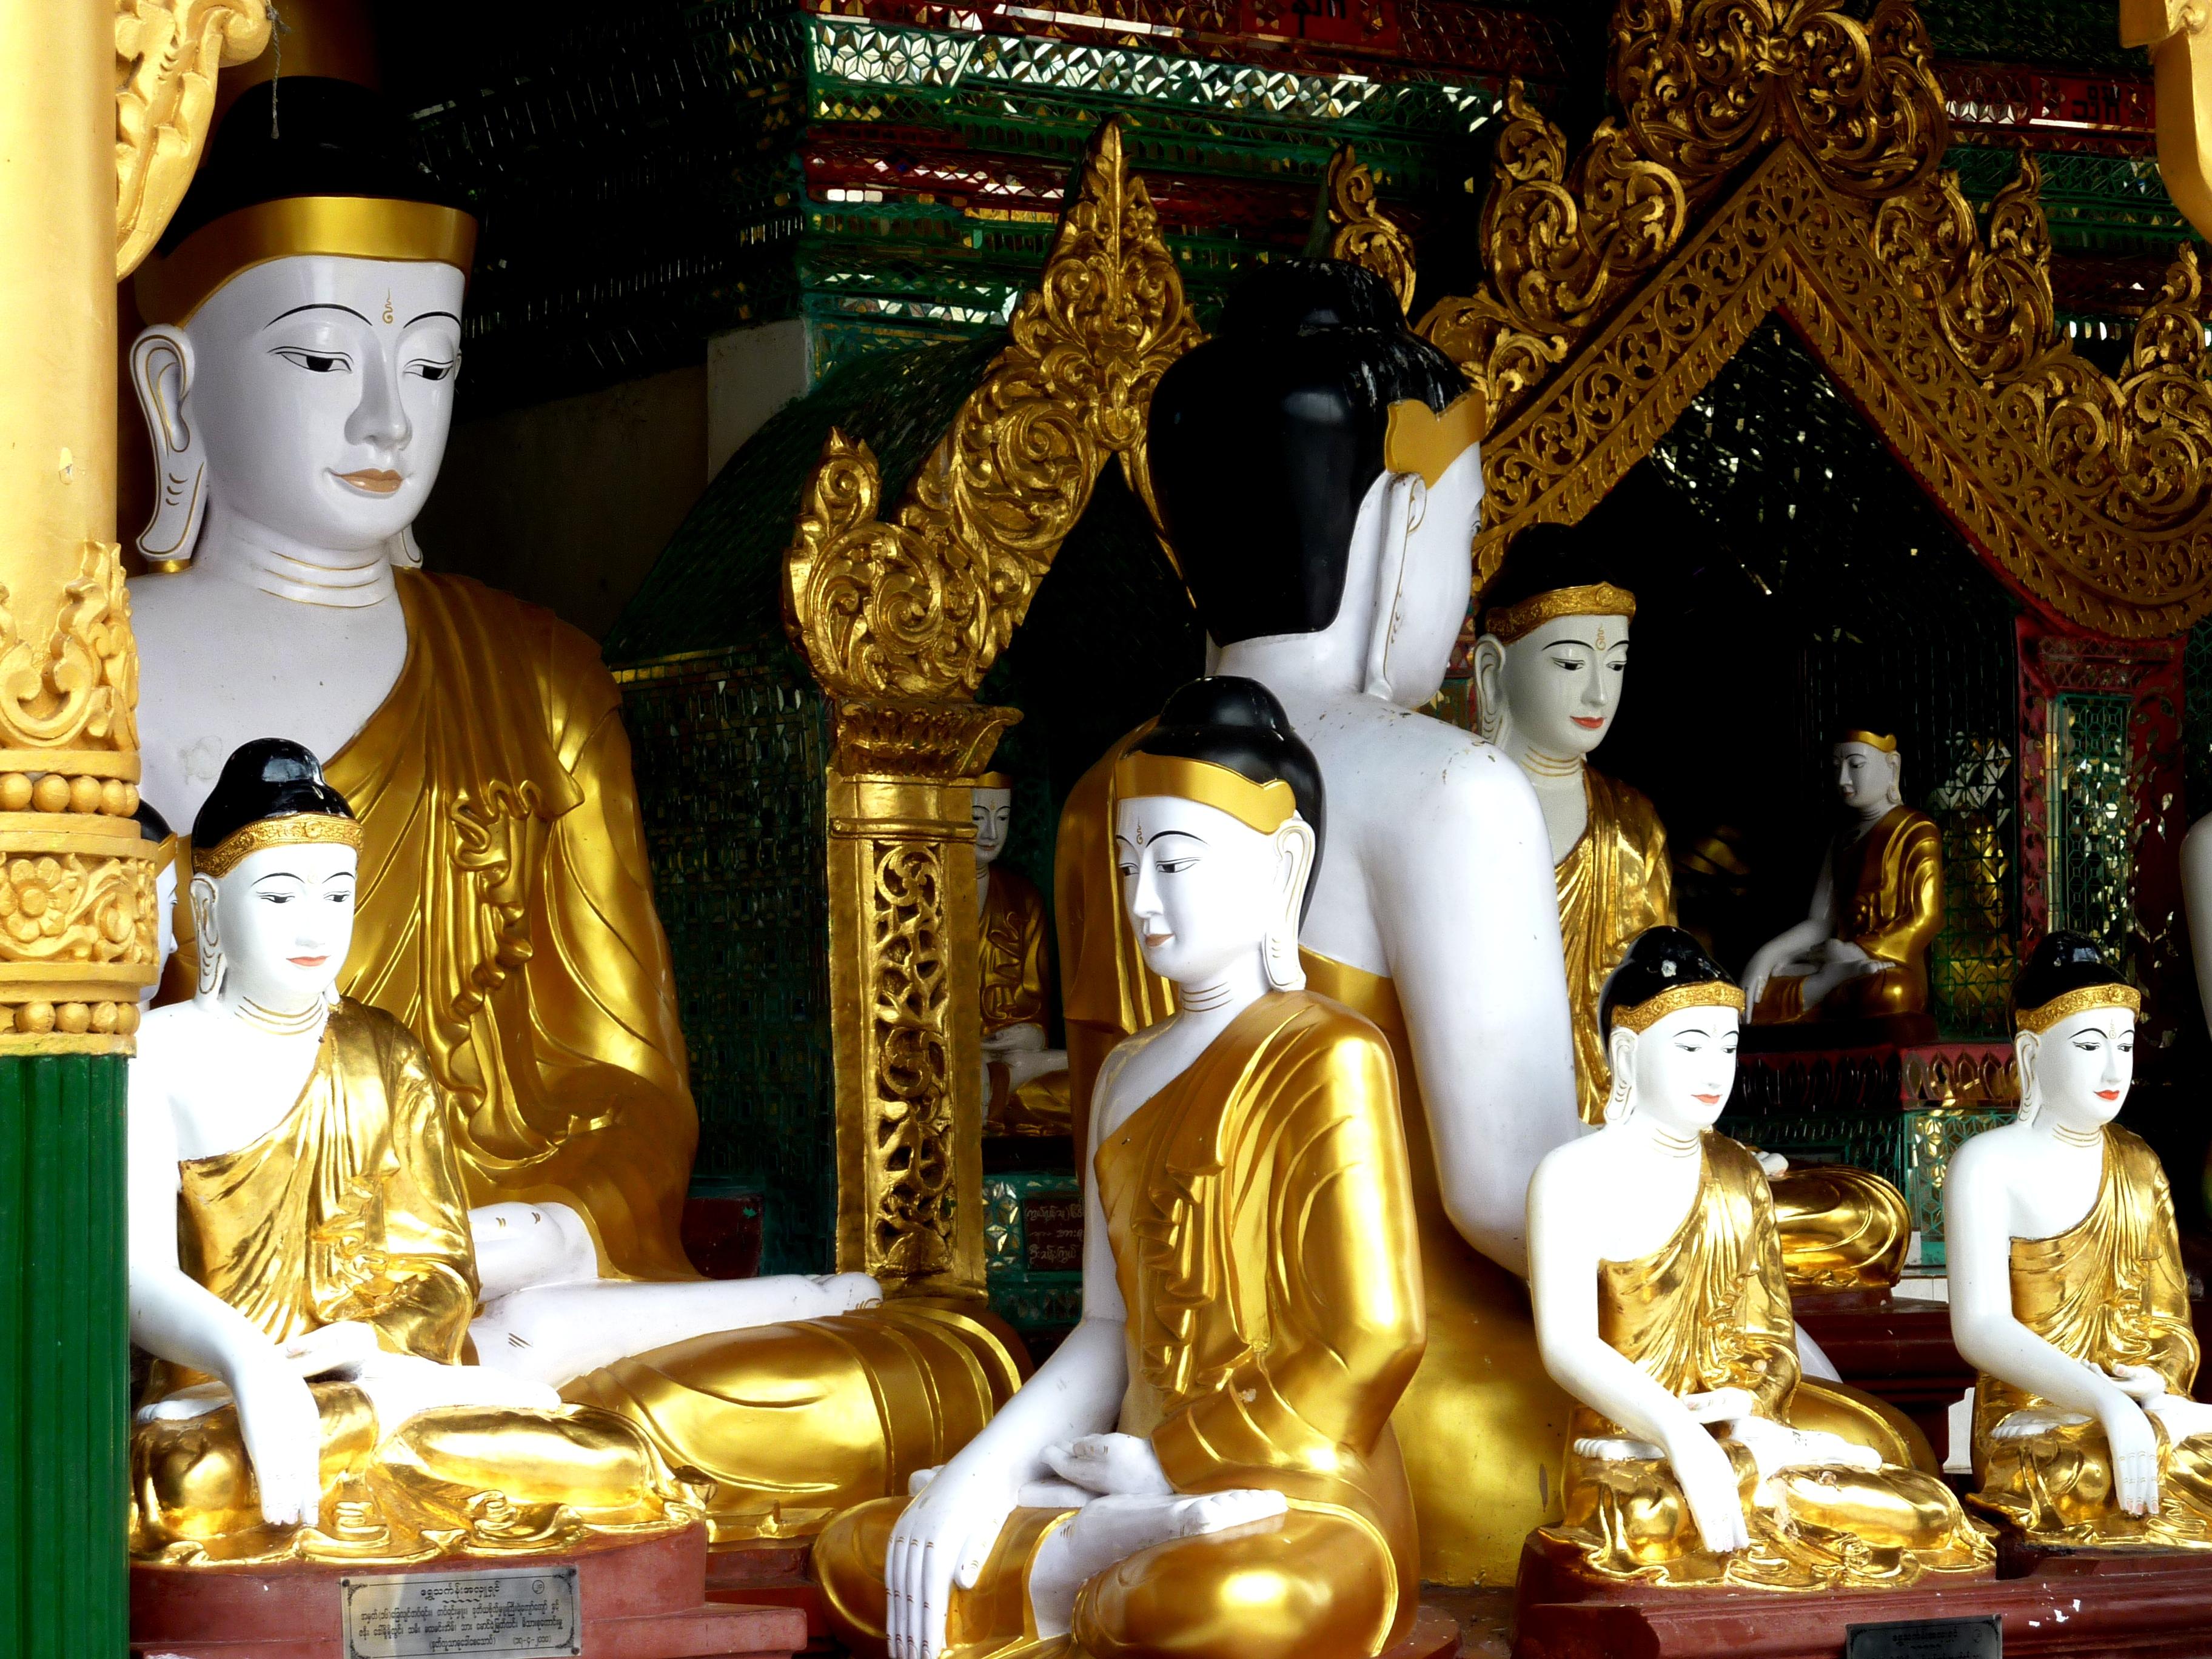 статуи будд в шведагоне